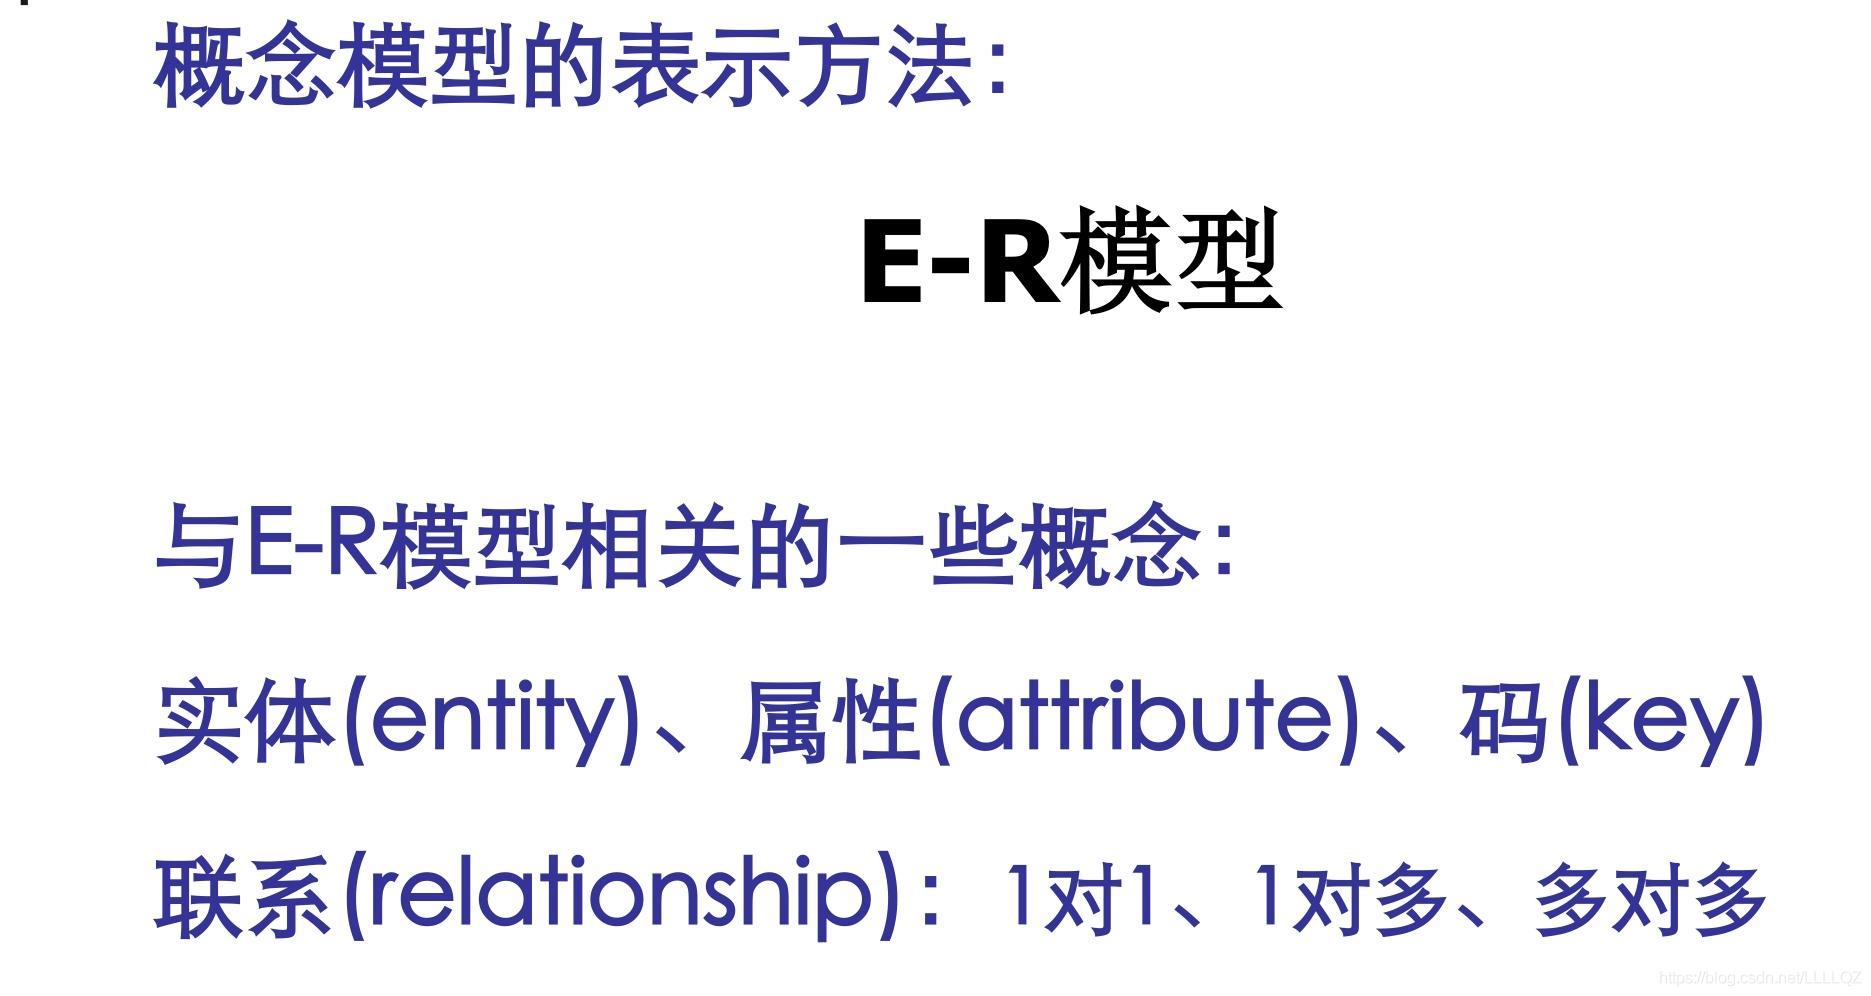 E-R模型